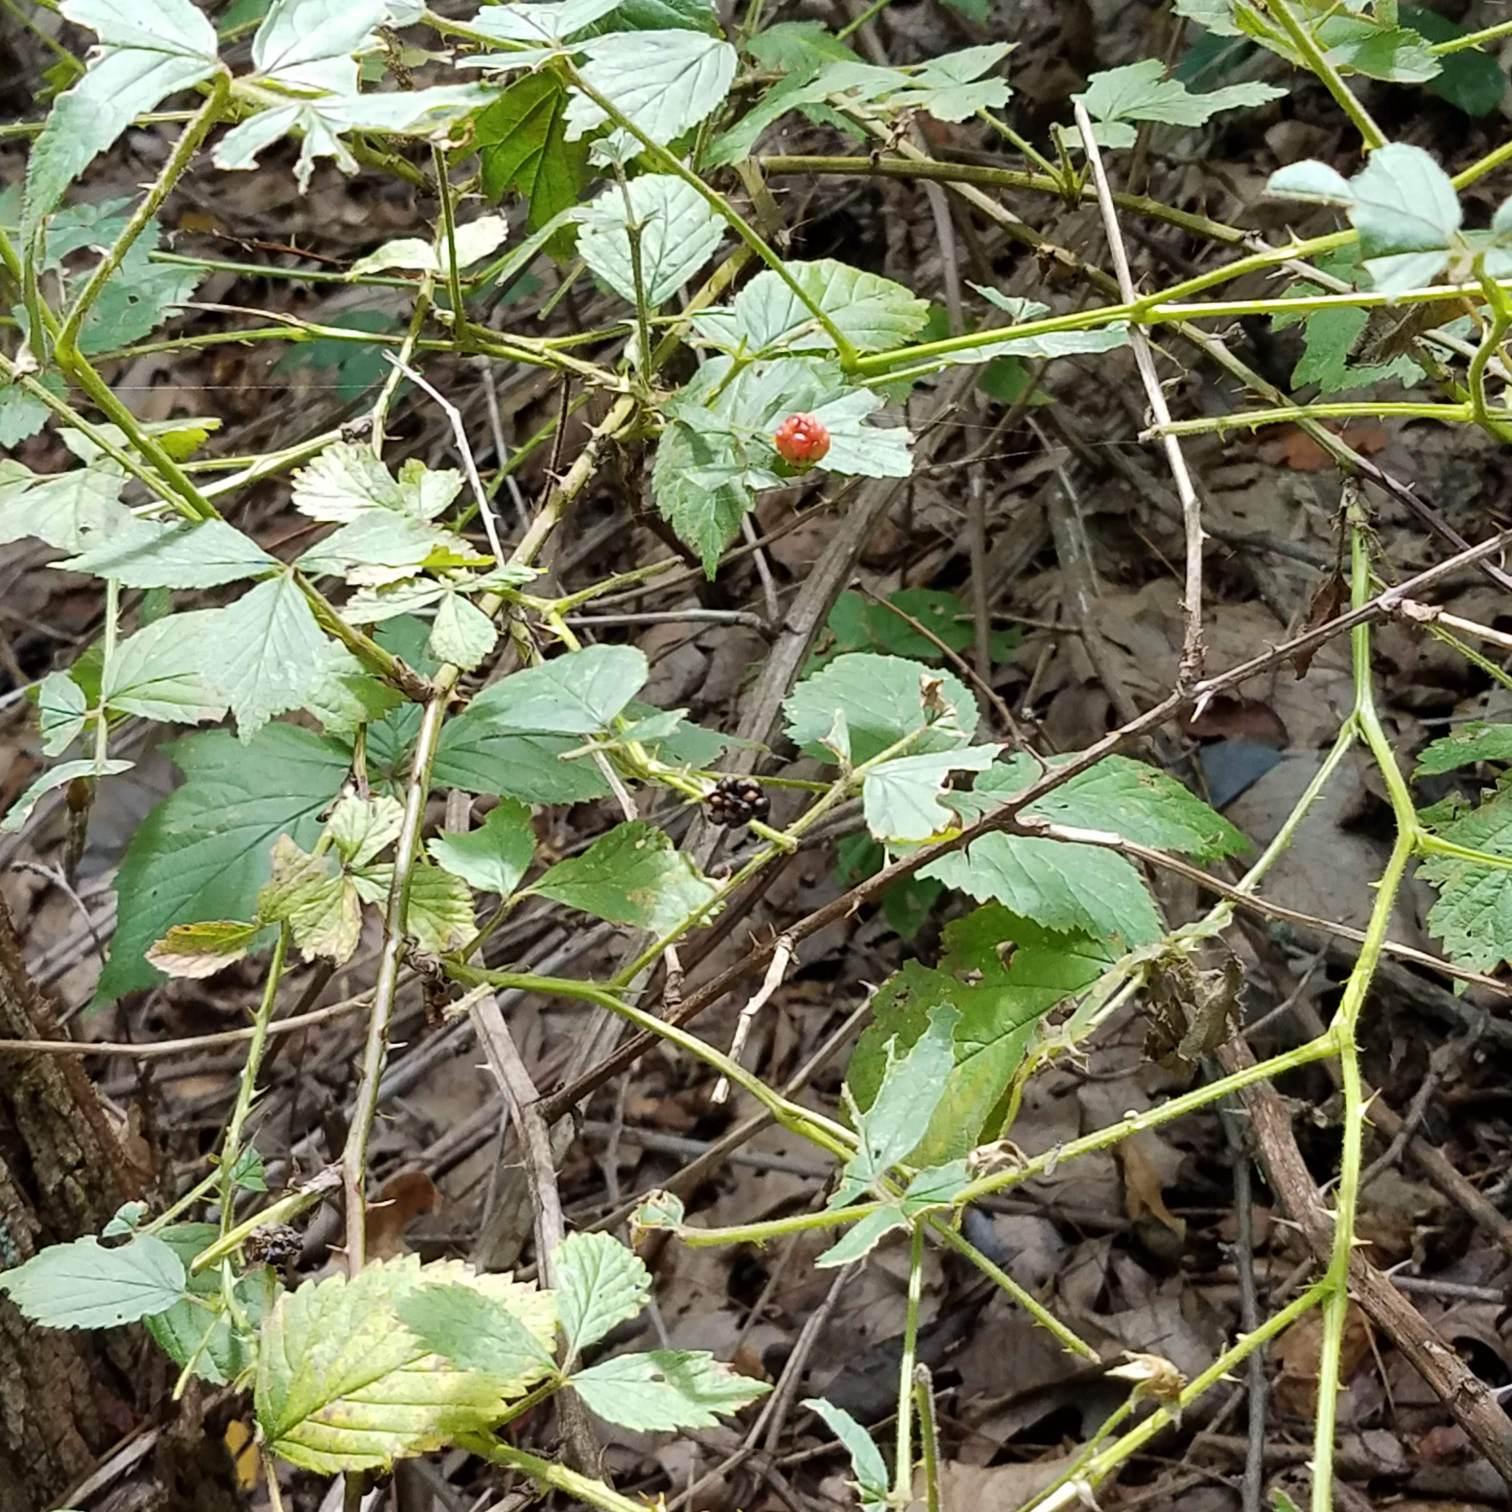 Sad little blackberries